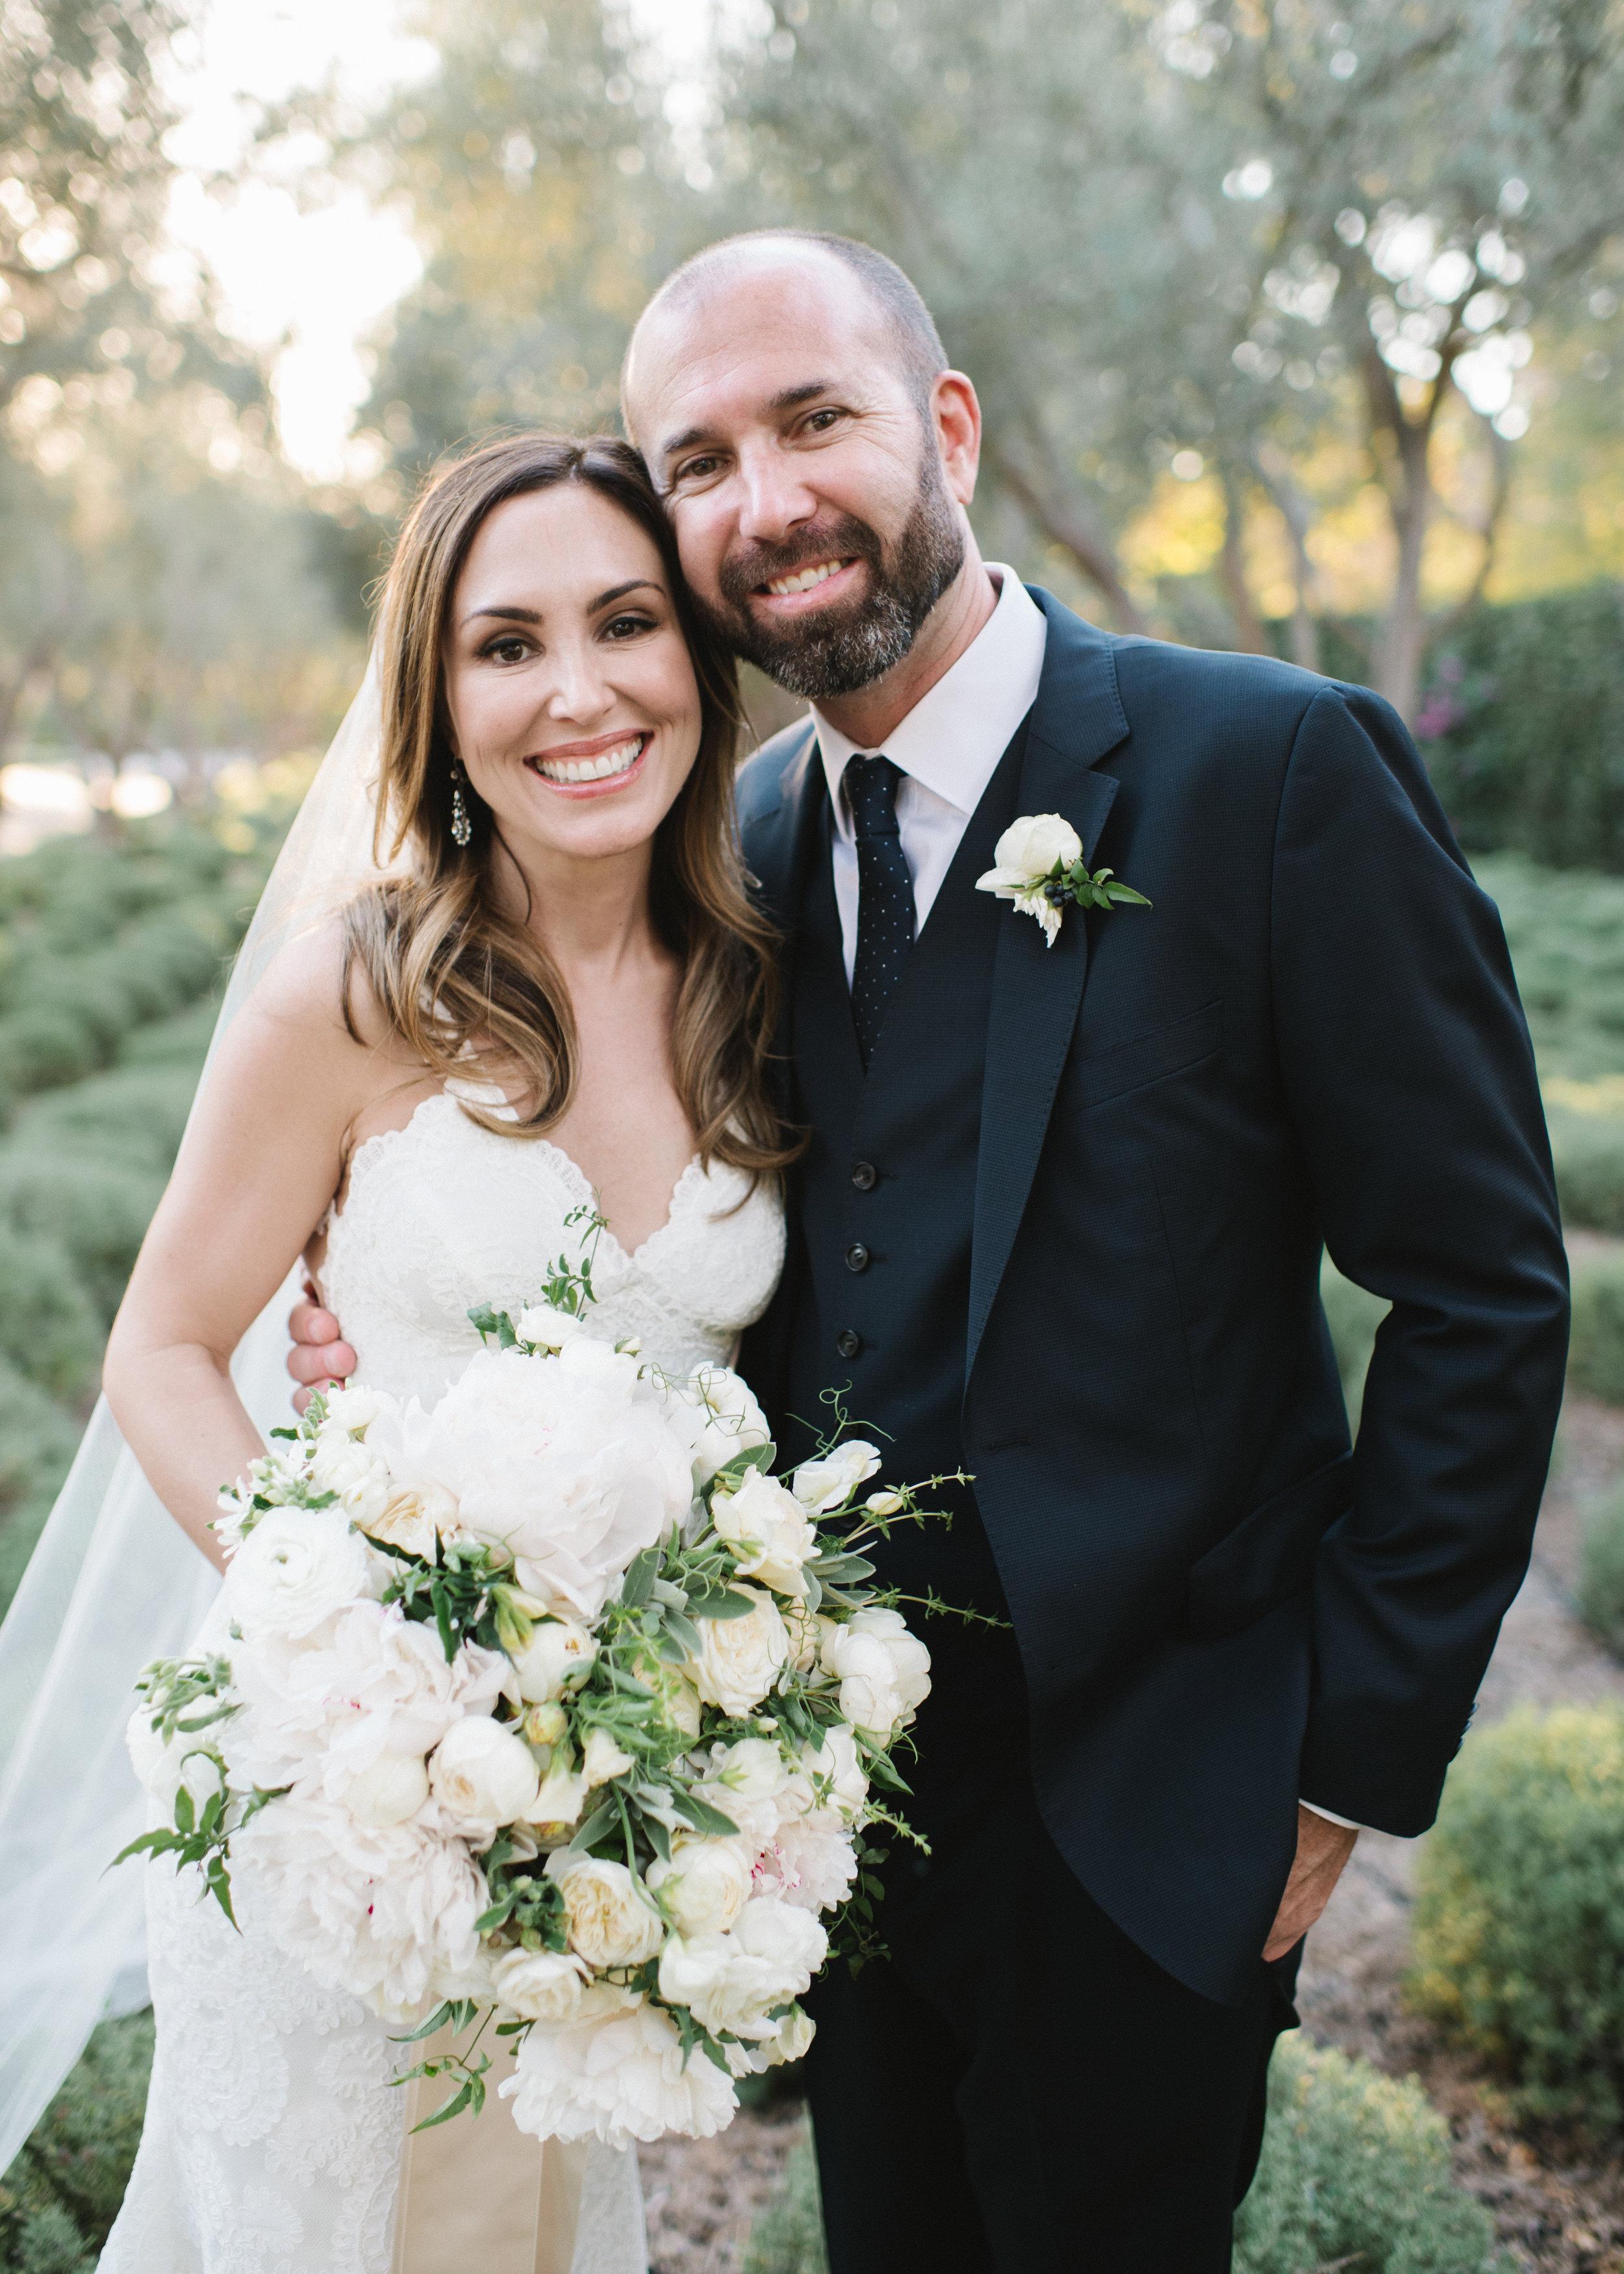 www.santabarbarawedding.com   Event of the Season   Norman and Blake   San Ysidro Ranch   Bride and Groom